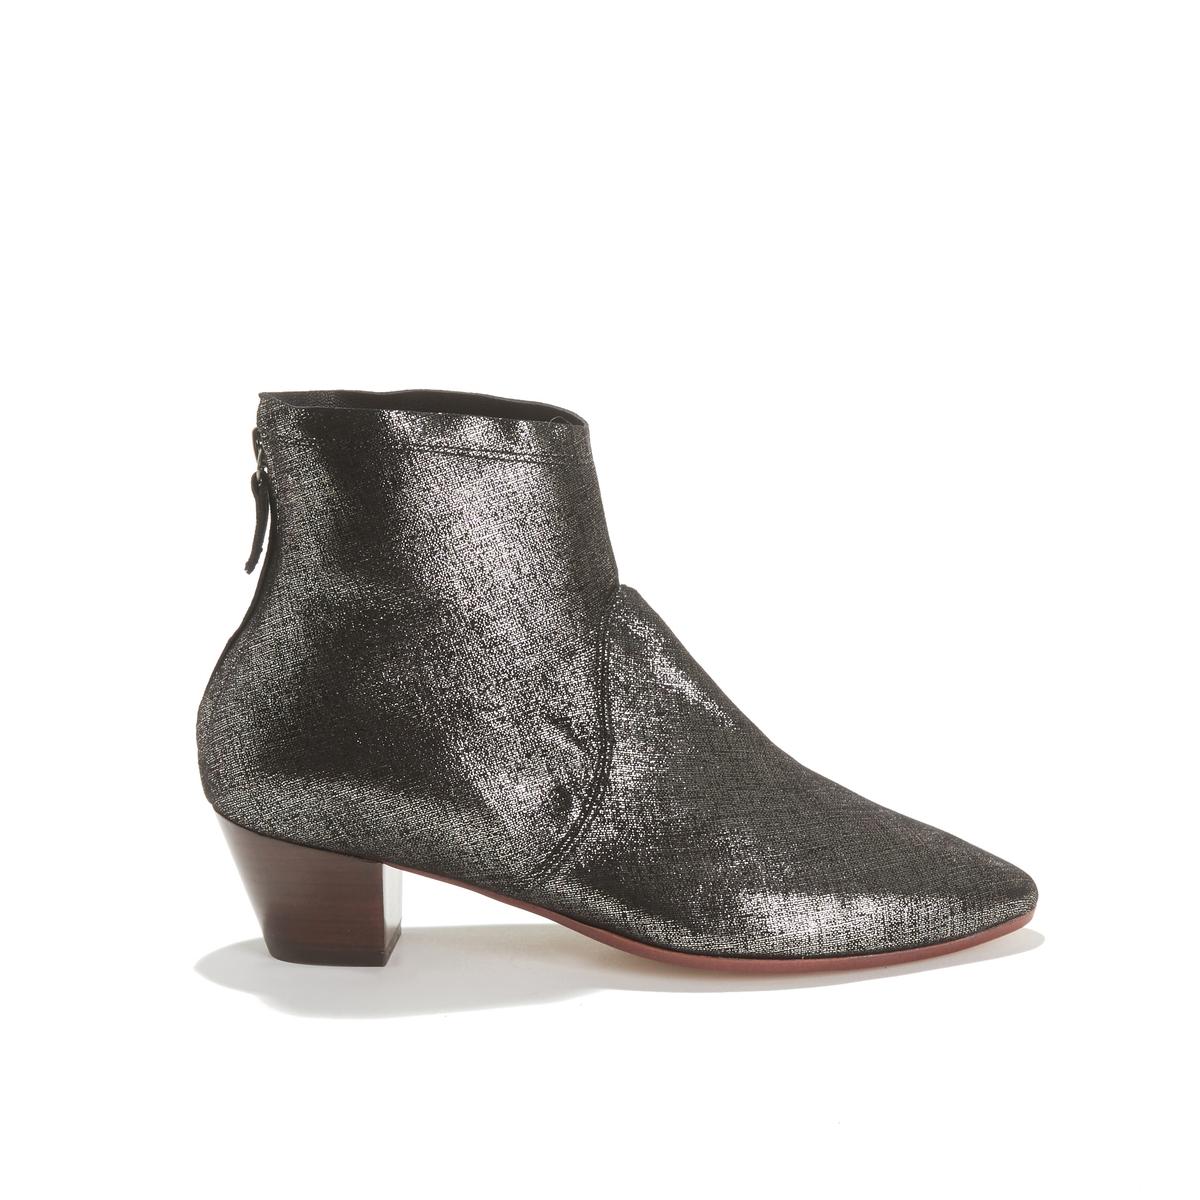 Ботильоны La Redoute Кожаные на каблуке LEAH CRACKLE 39 серый цены онлайн